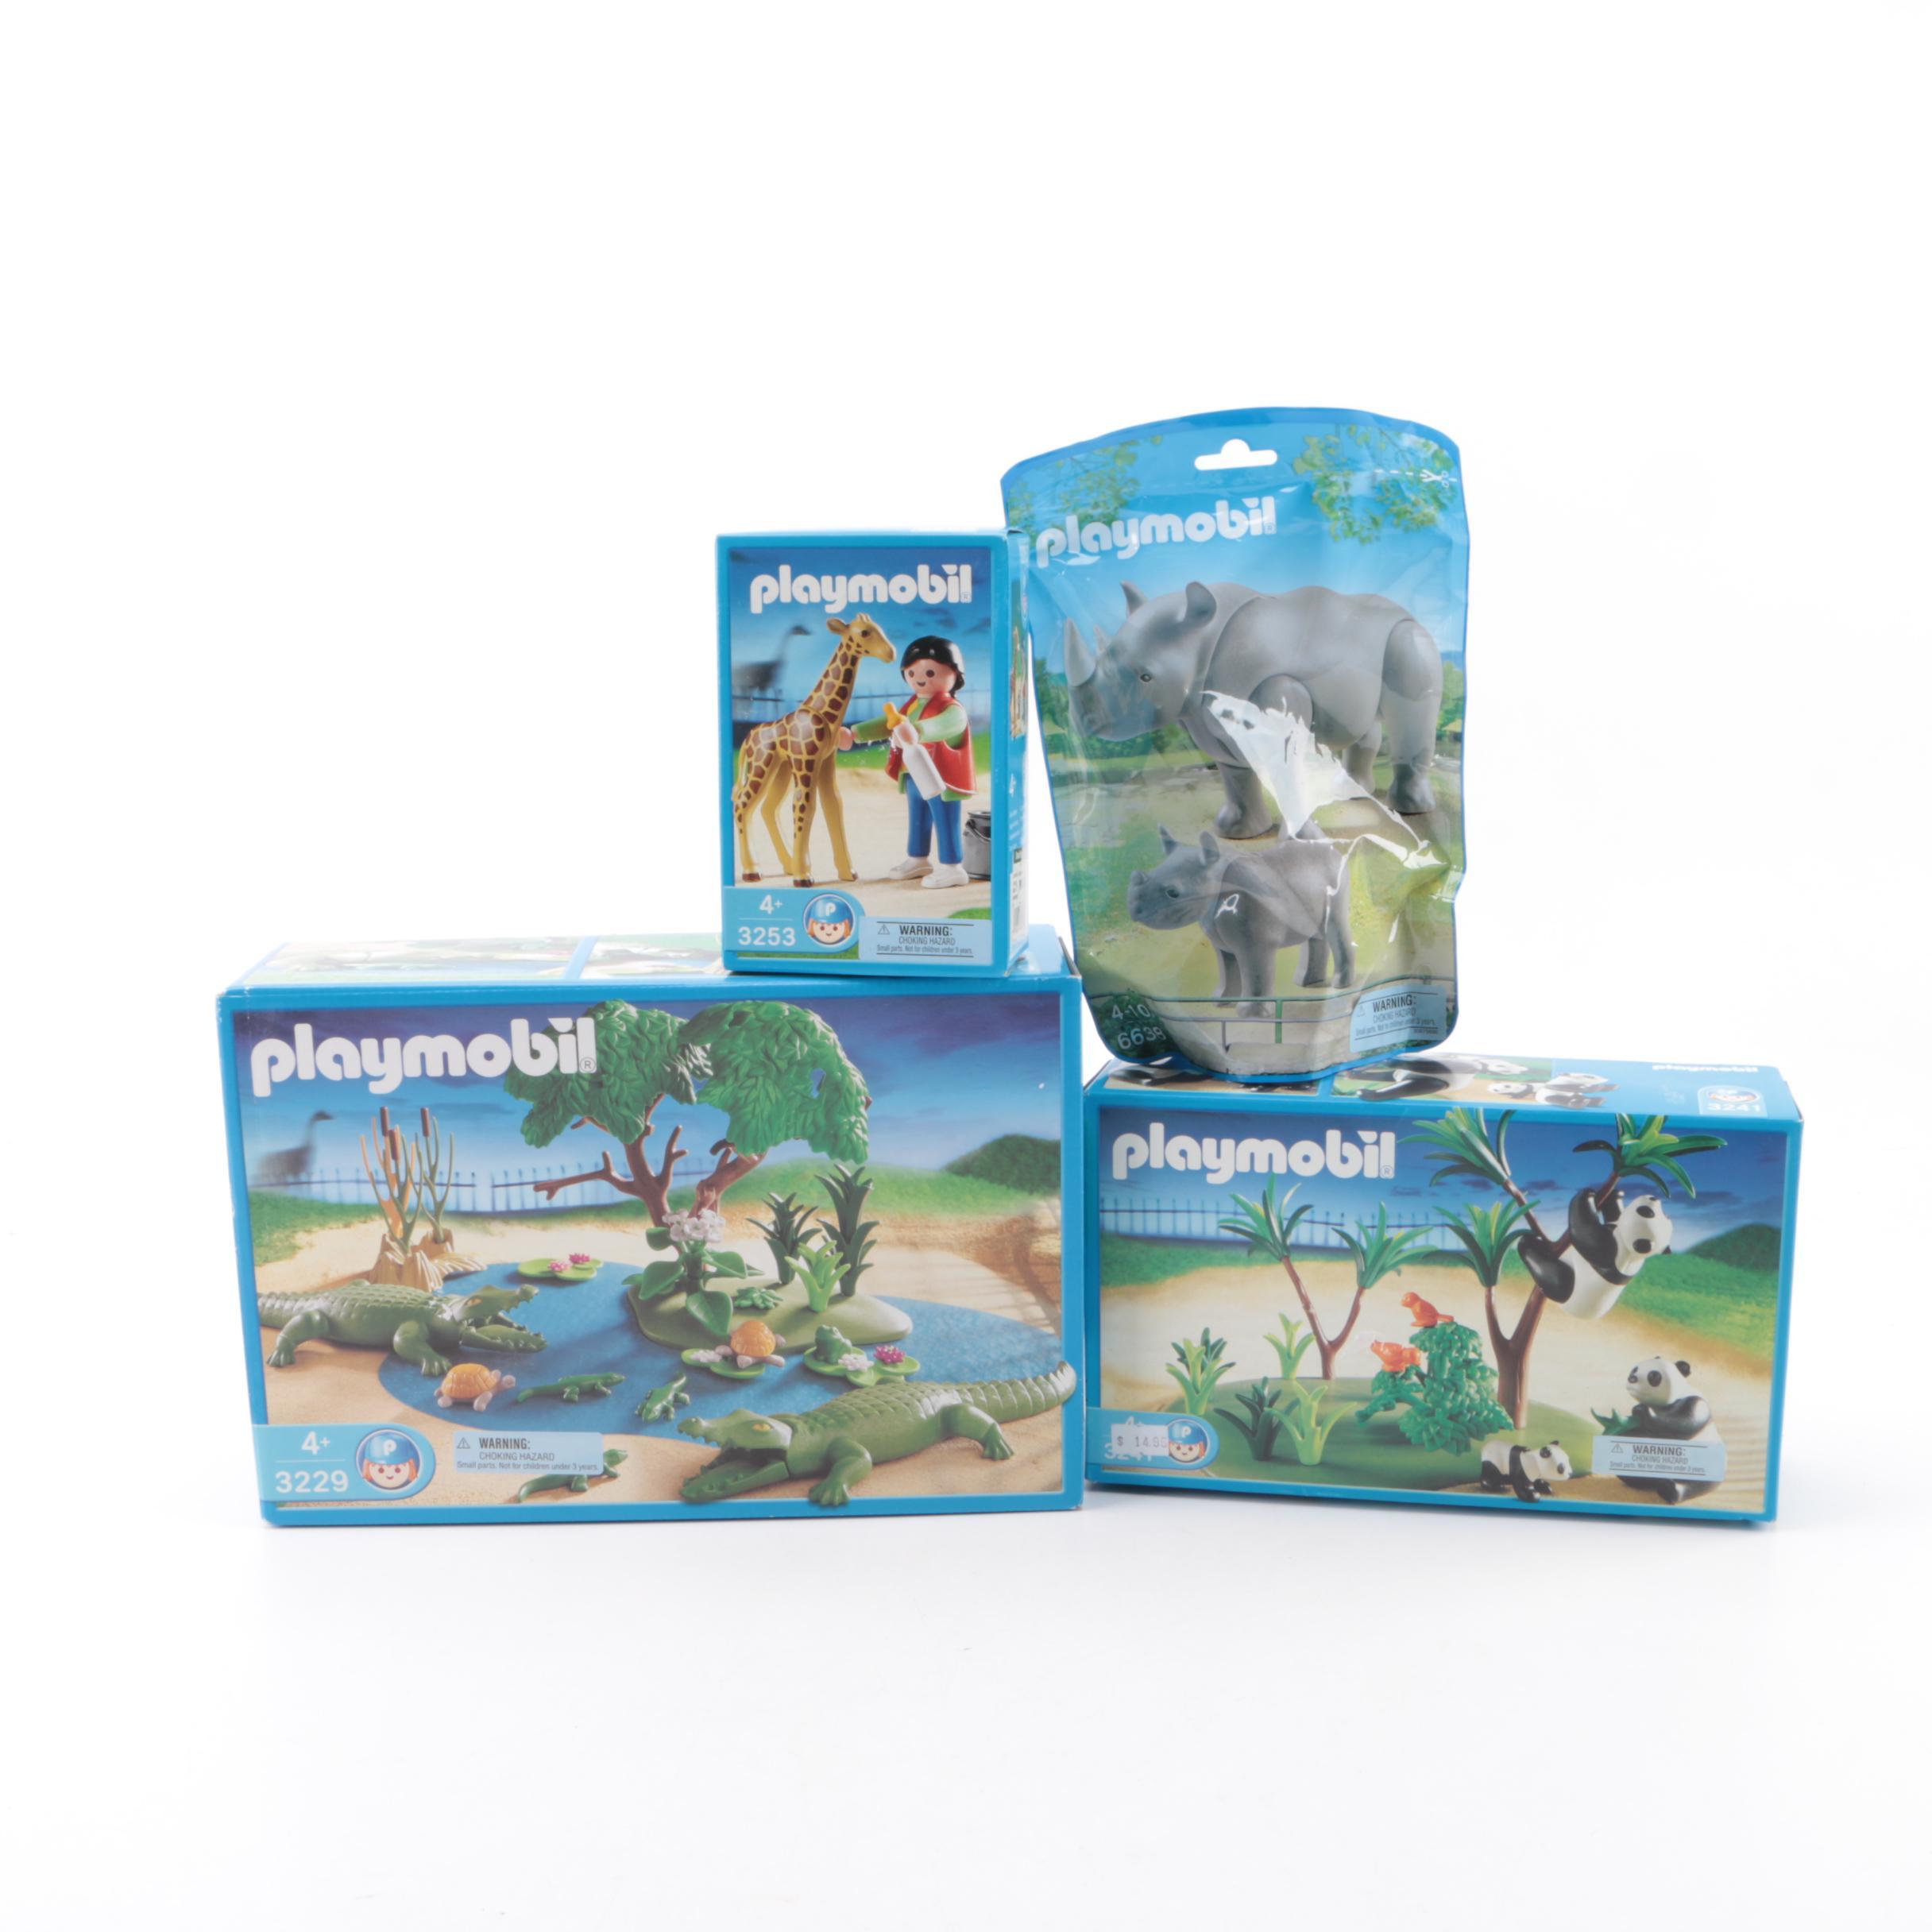 Playmobil Echse Echsen Terrarium Dinosaurier Zoo Tierpark Expedition